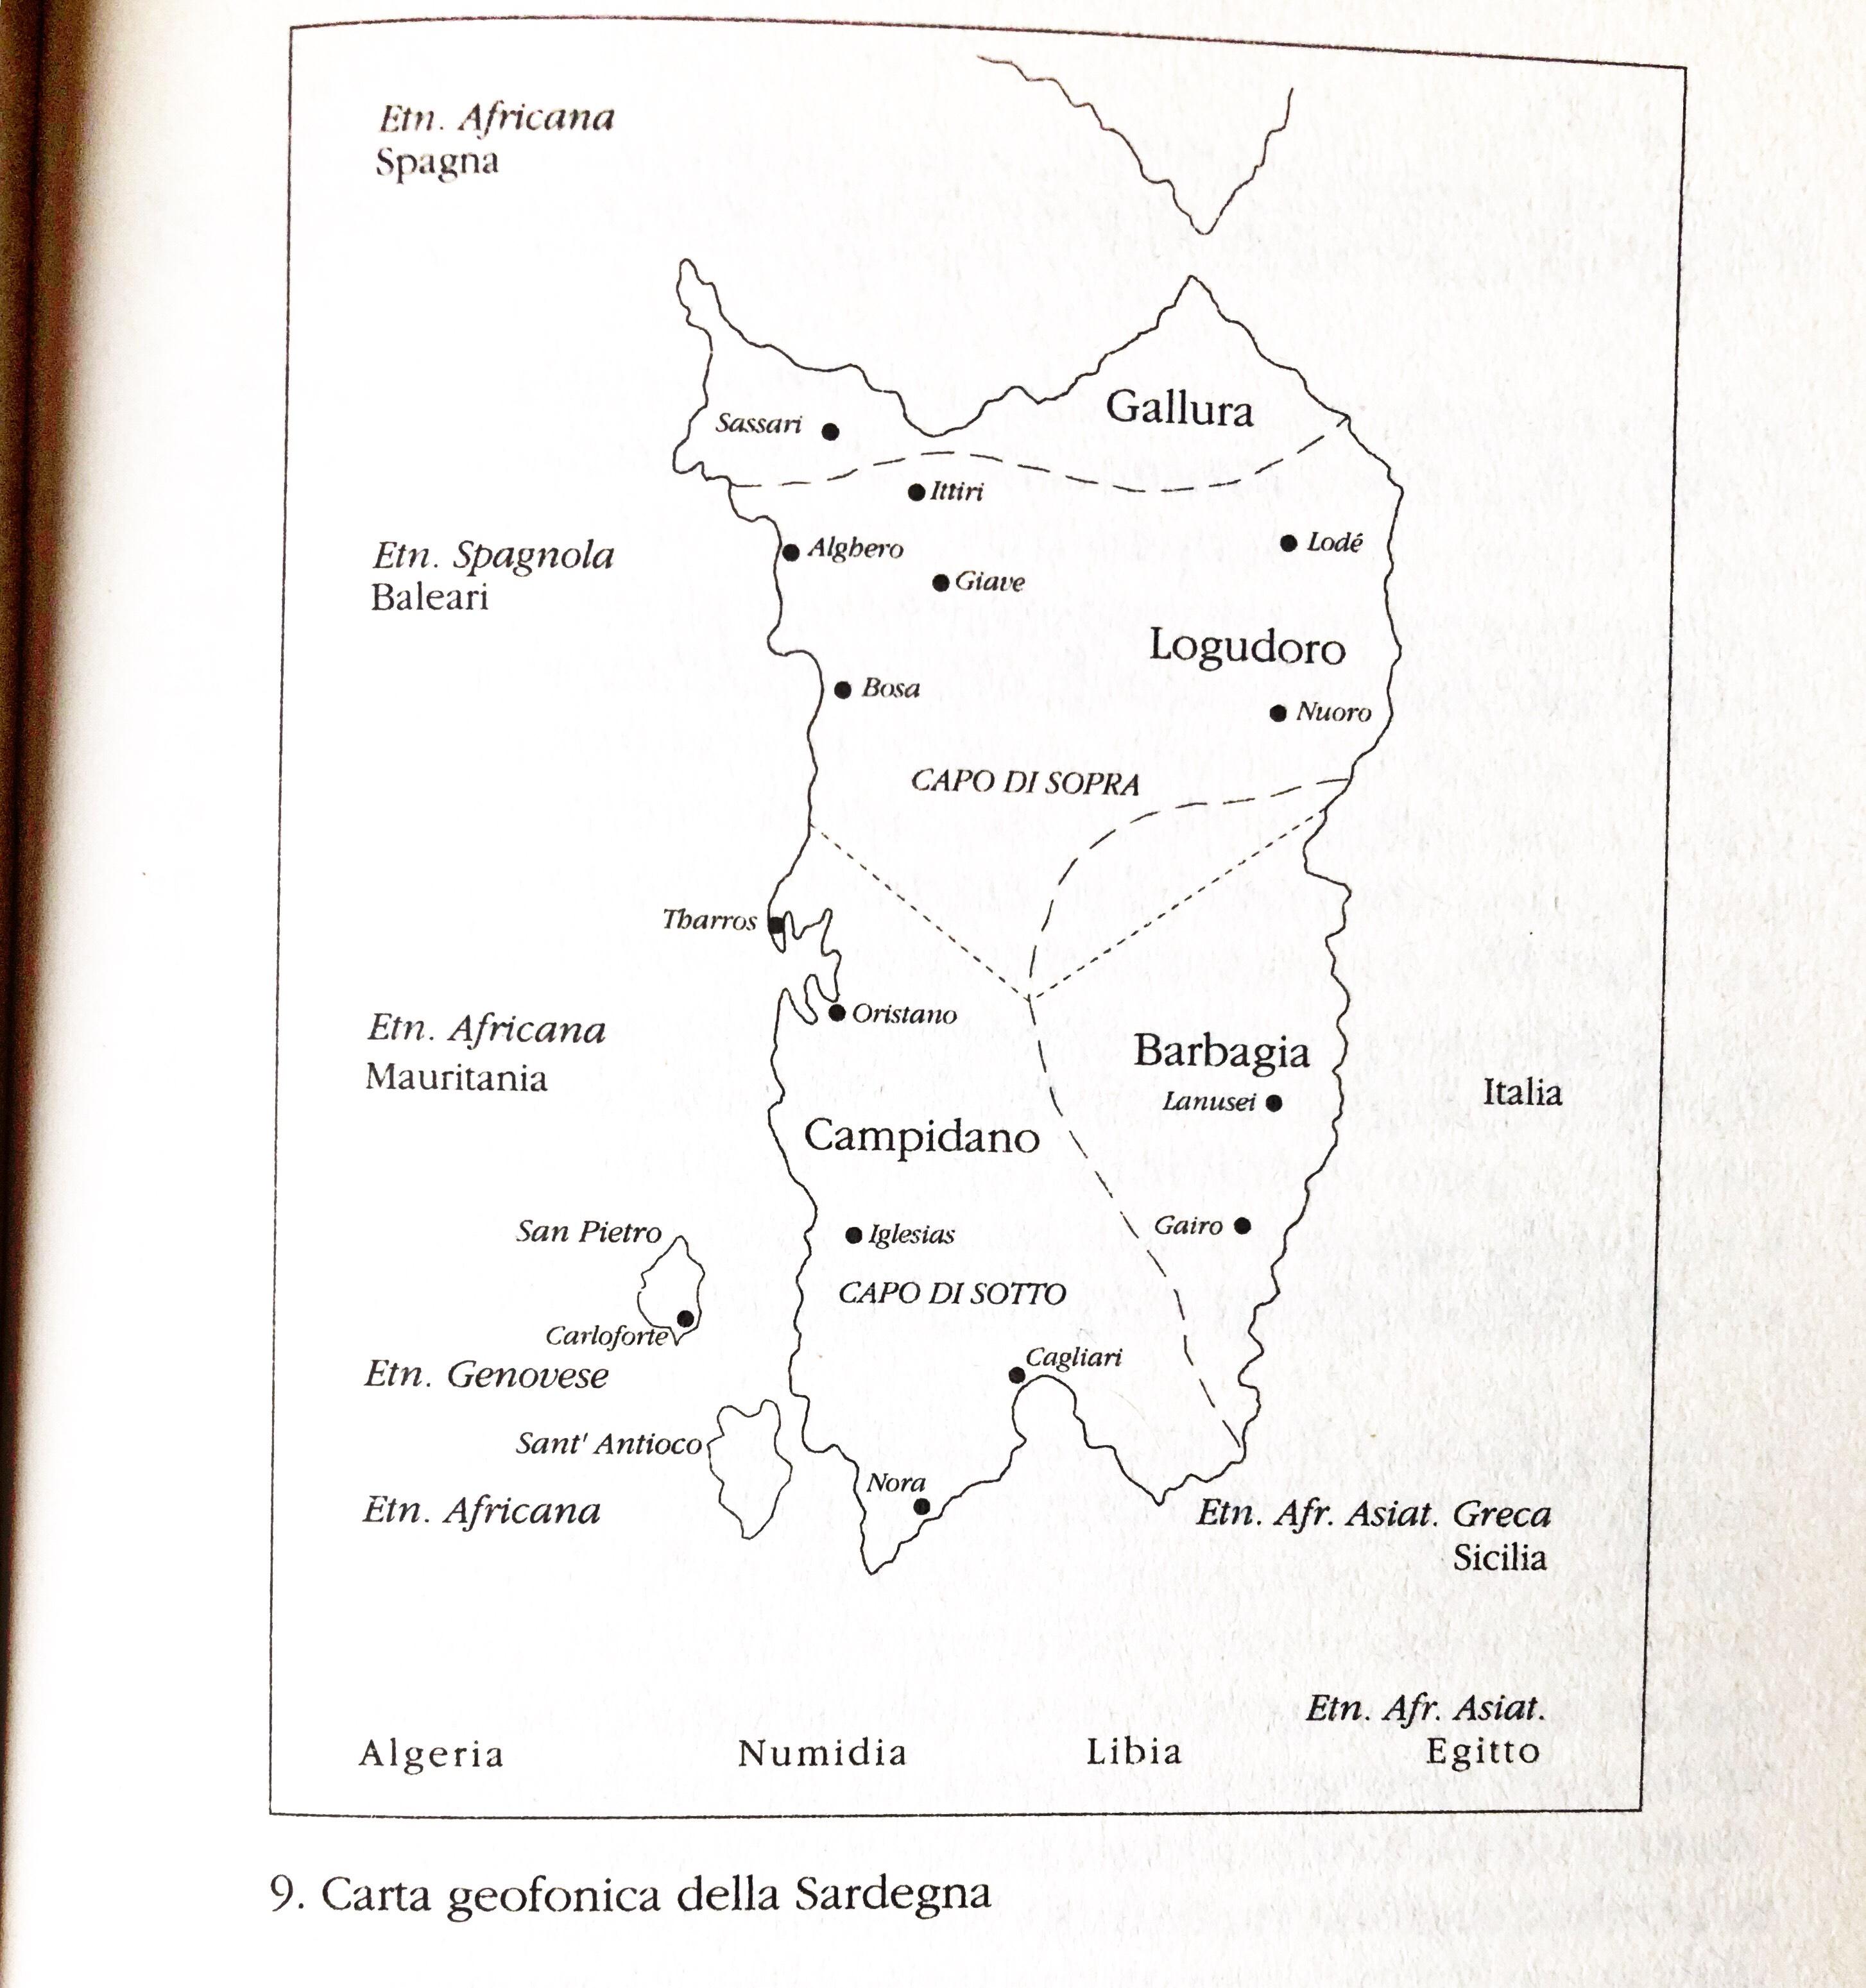 Bosa Cartina Geografica.Carta Geofonica Della Sardegna Soundwalk